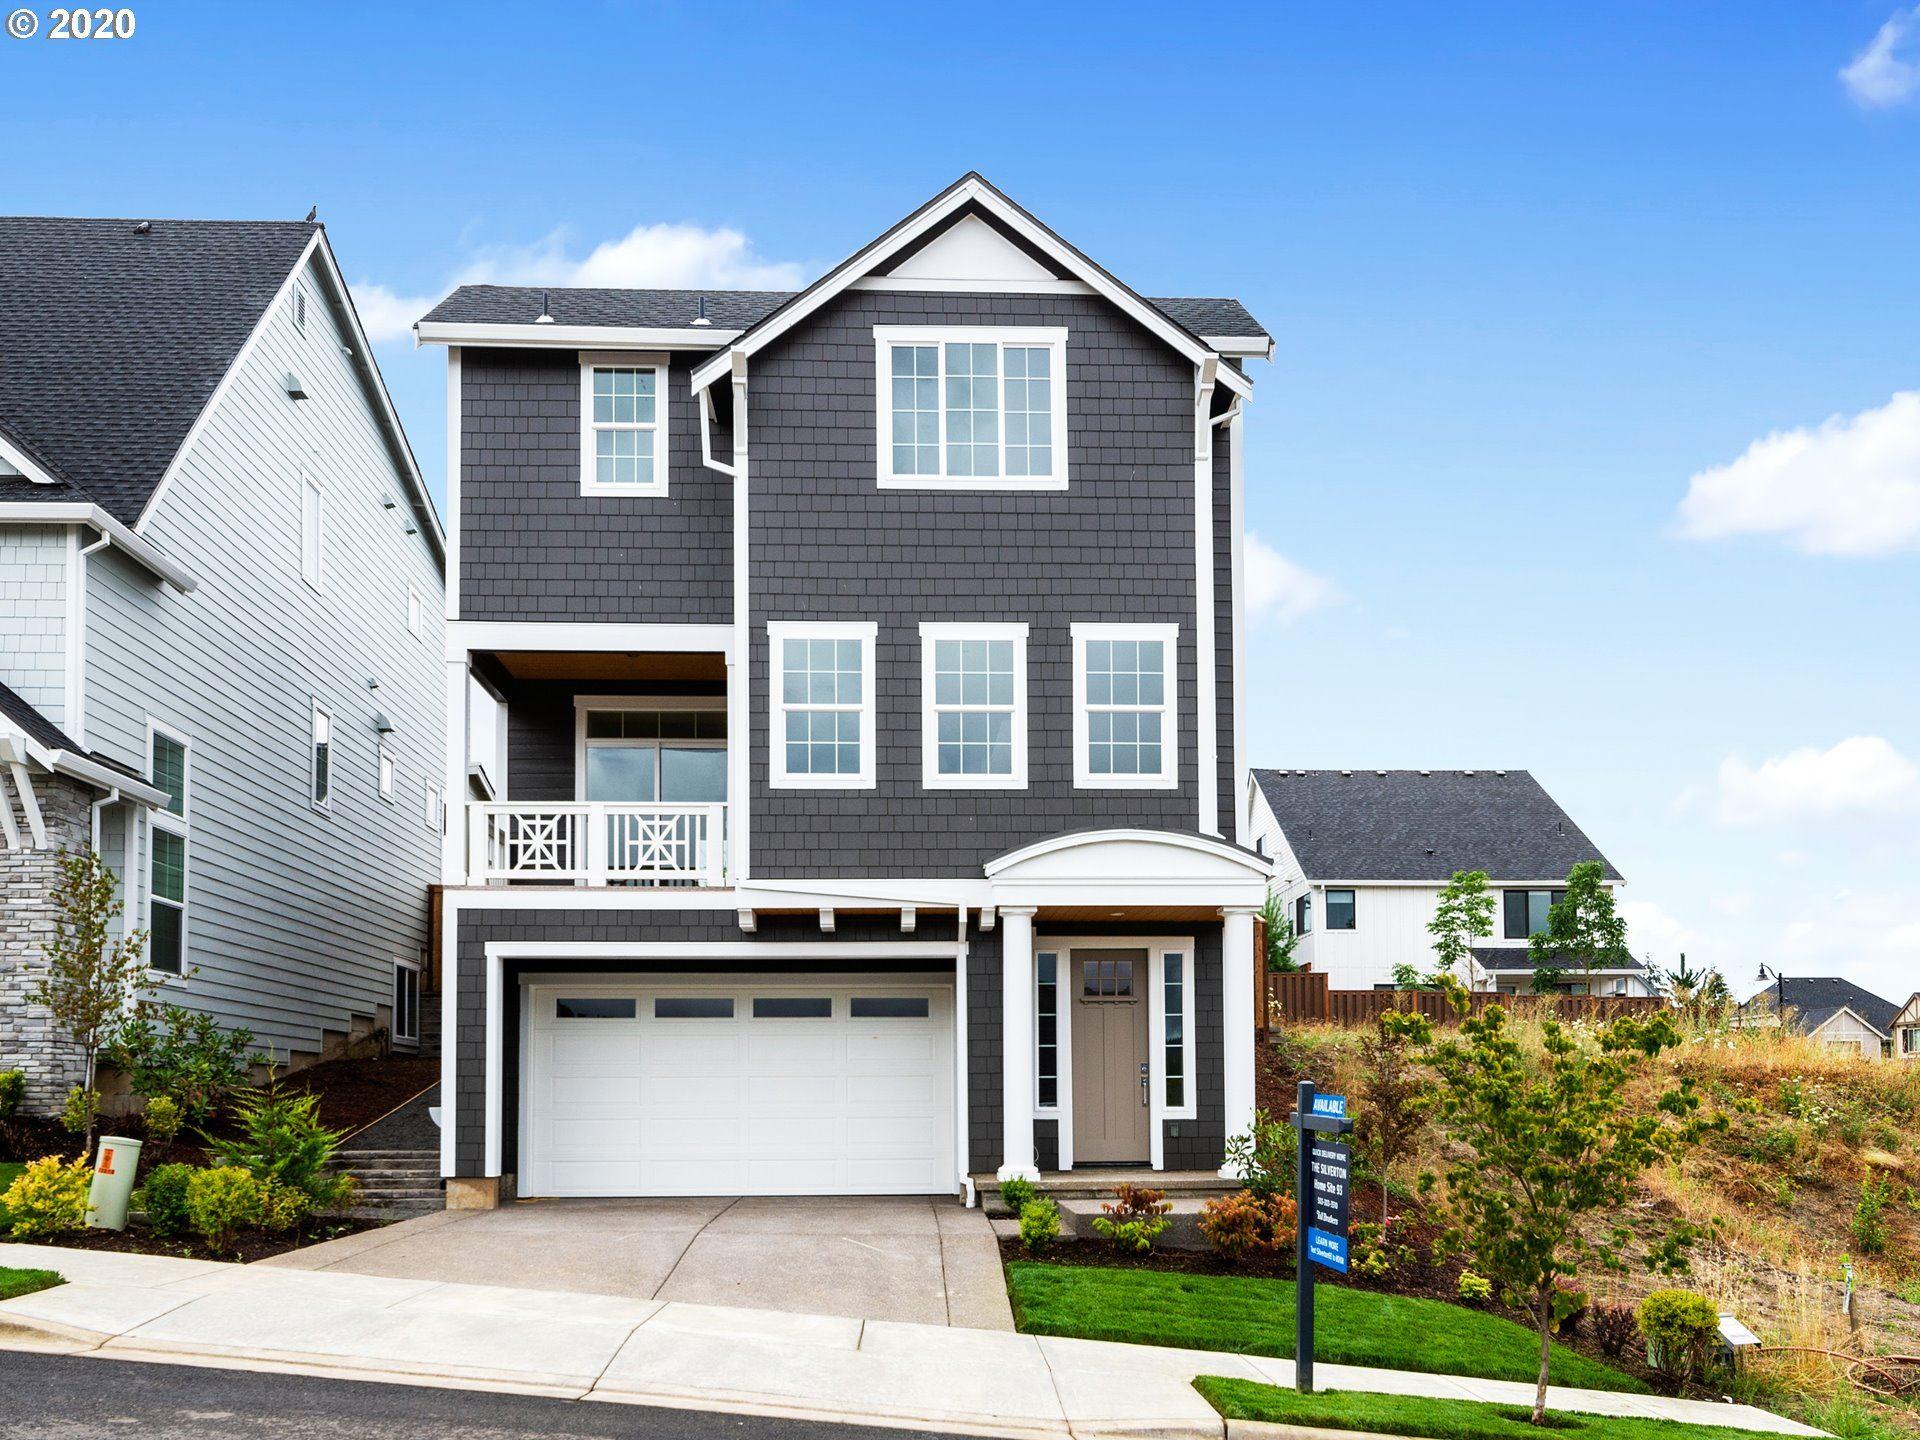 12316 NW Hiller LN #L93, Portland, OR 97229 - MLS#: 20687991